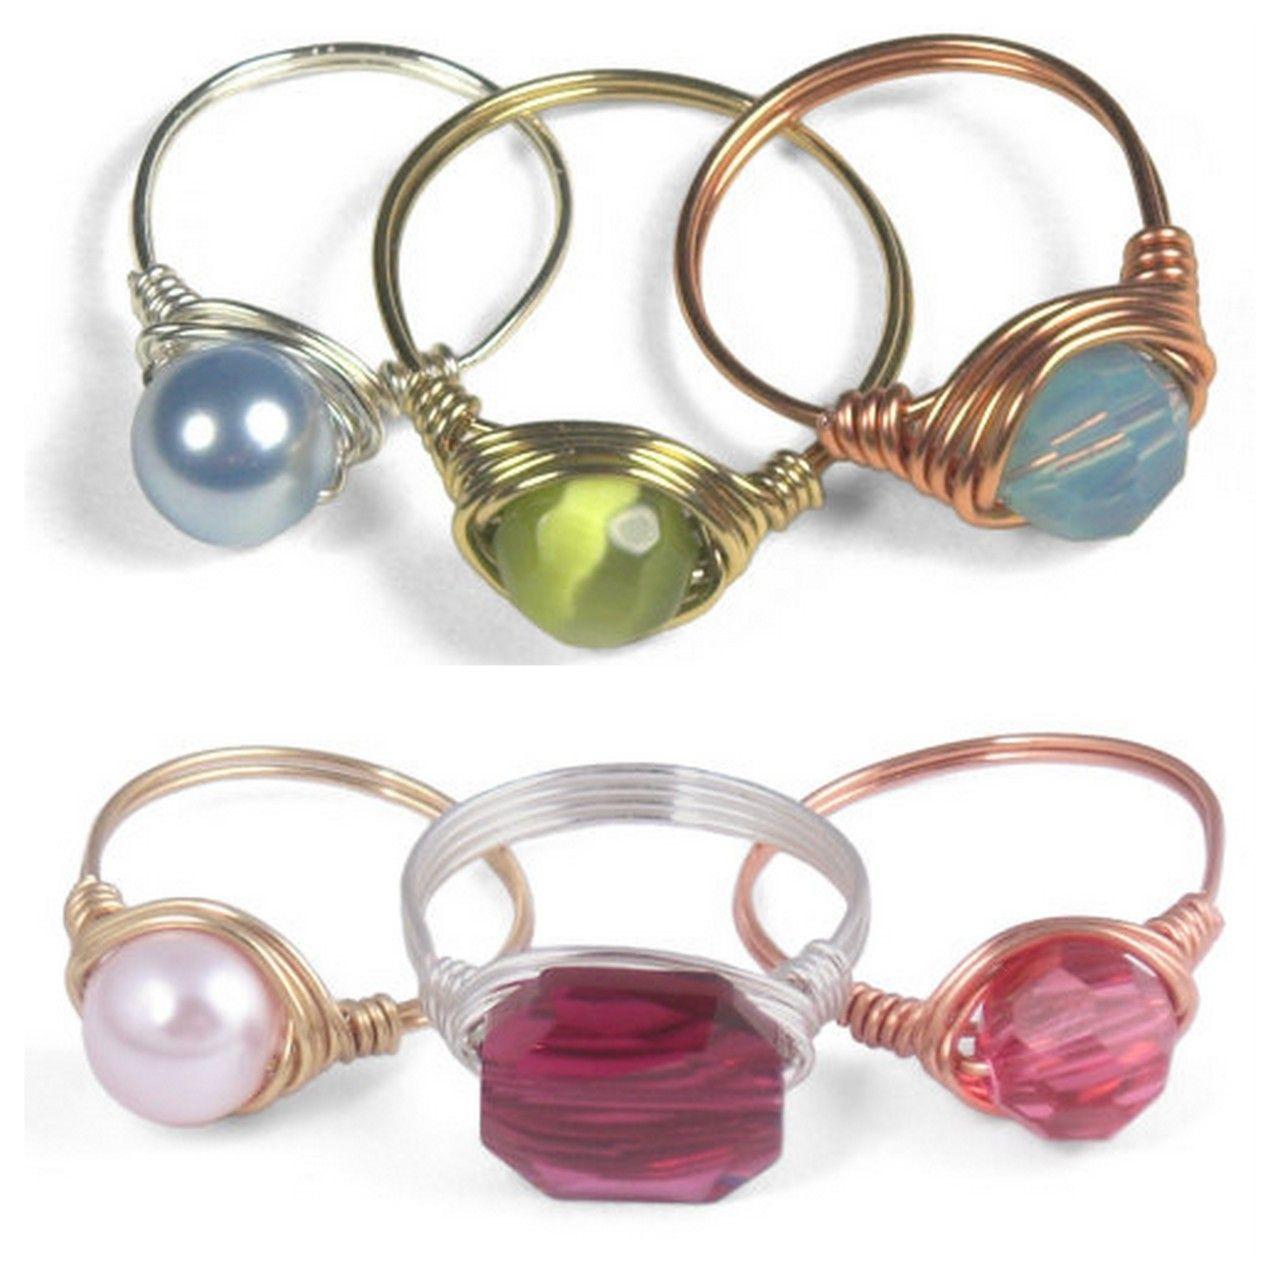 truebluemeandyou: DIY Beginner Wire Wrapped Ring Tutorial. Ring ...